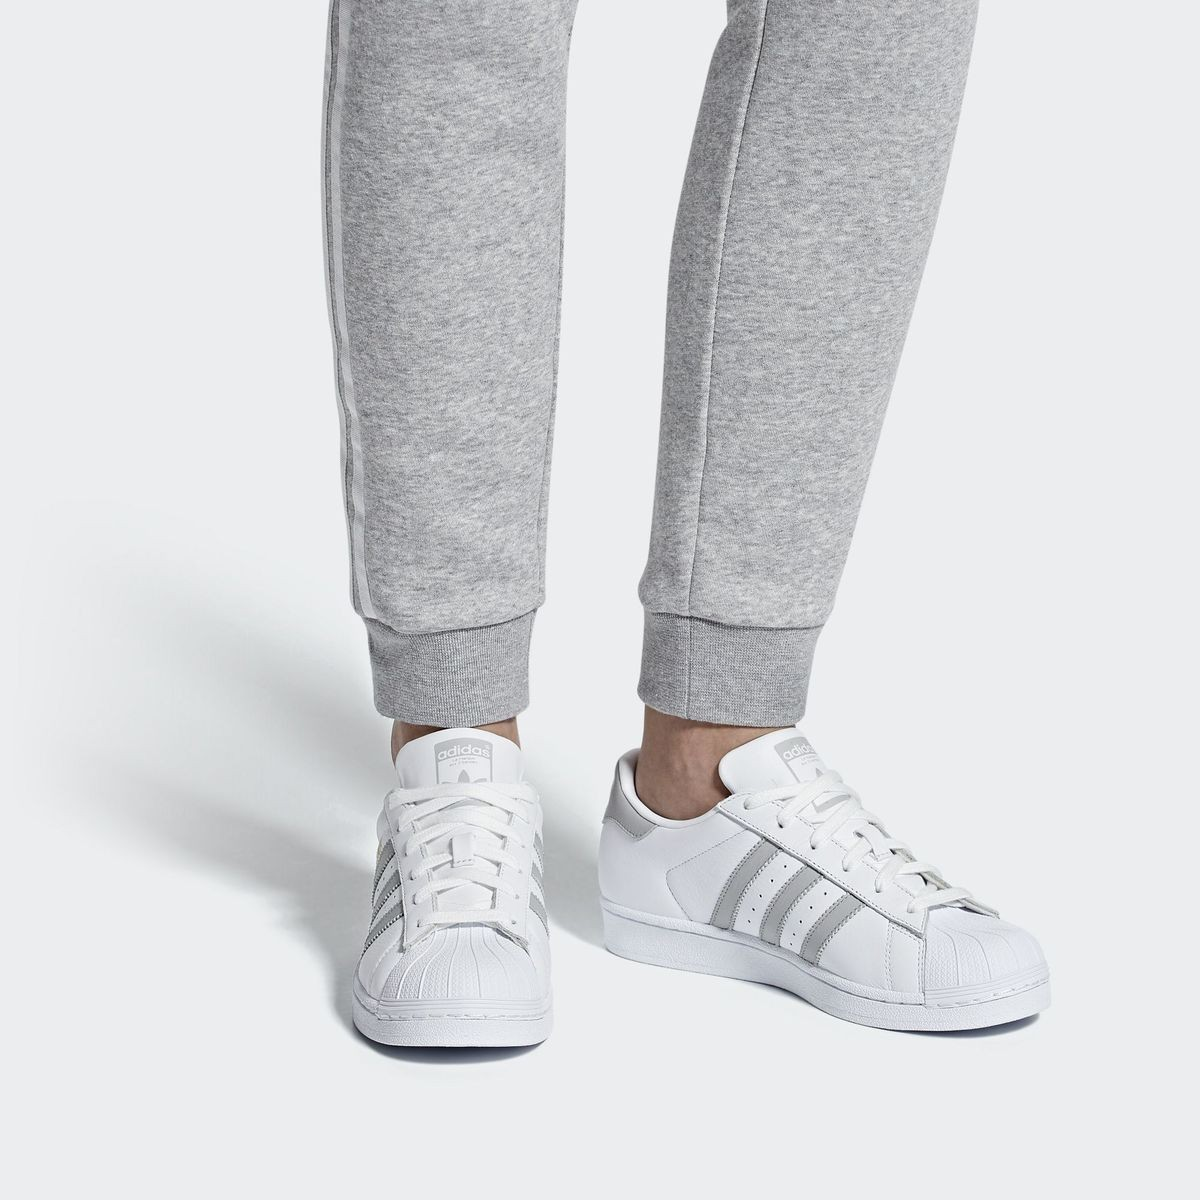 chaussure adidas femme 40 superstar